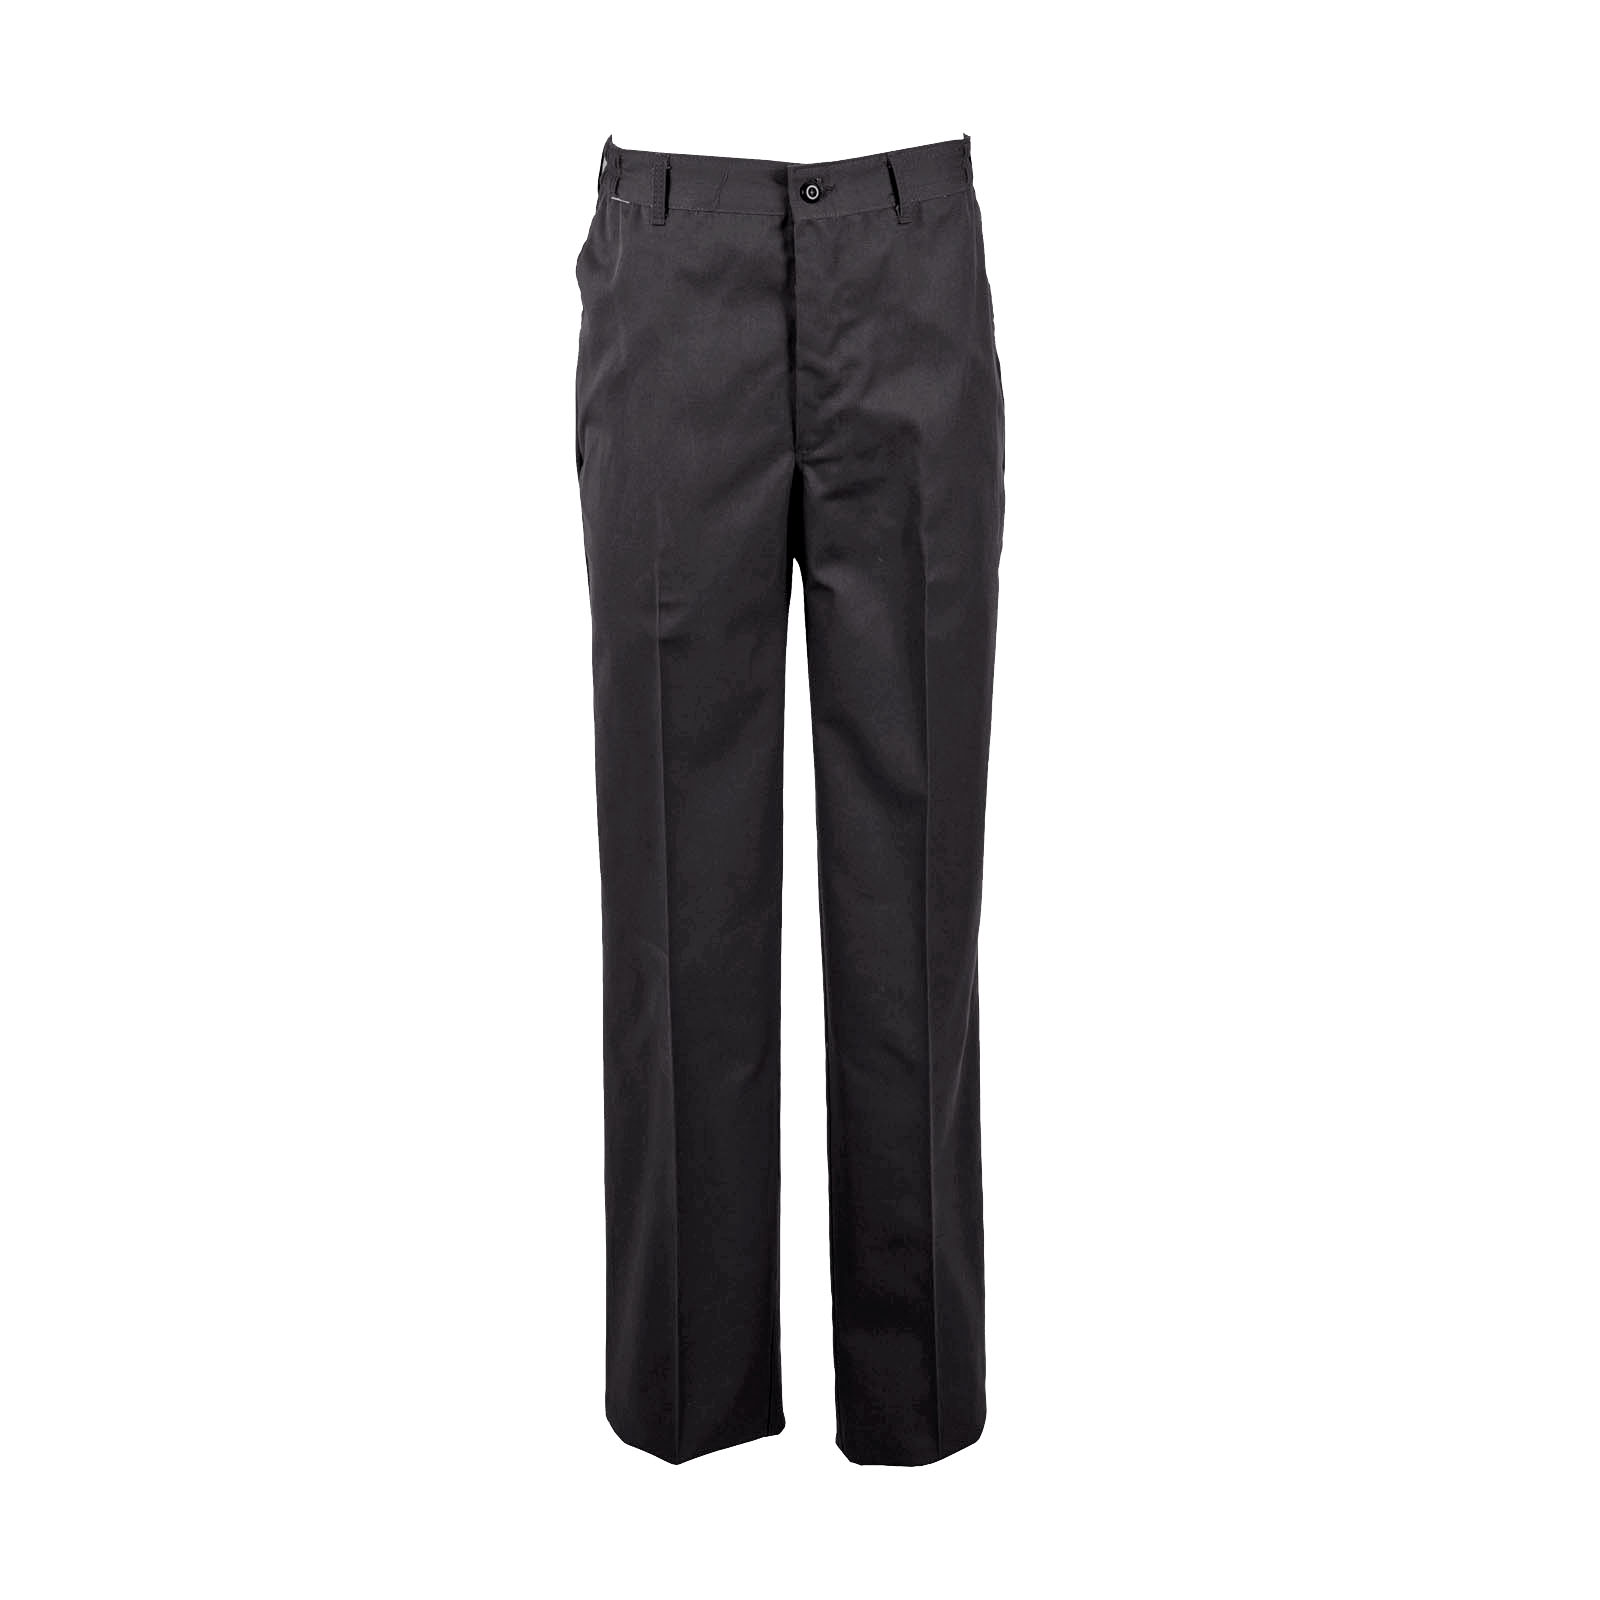 65/35 Men's Comfort Fit Industrial Flex-Waist Work Pant-